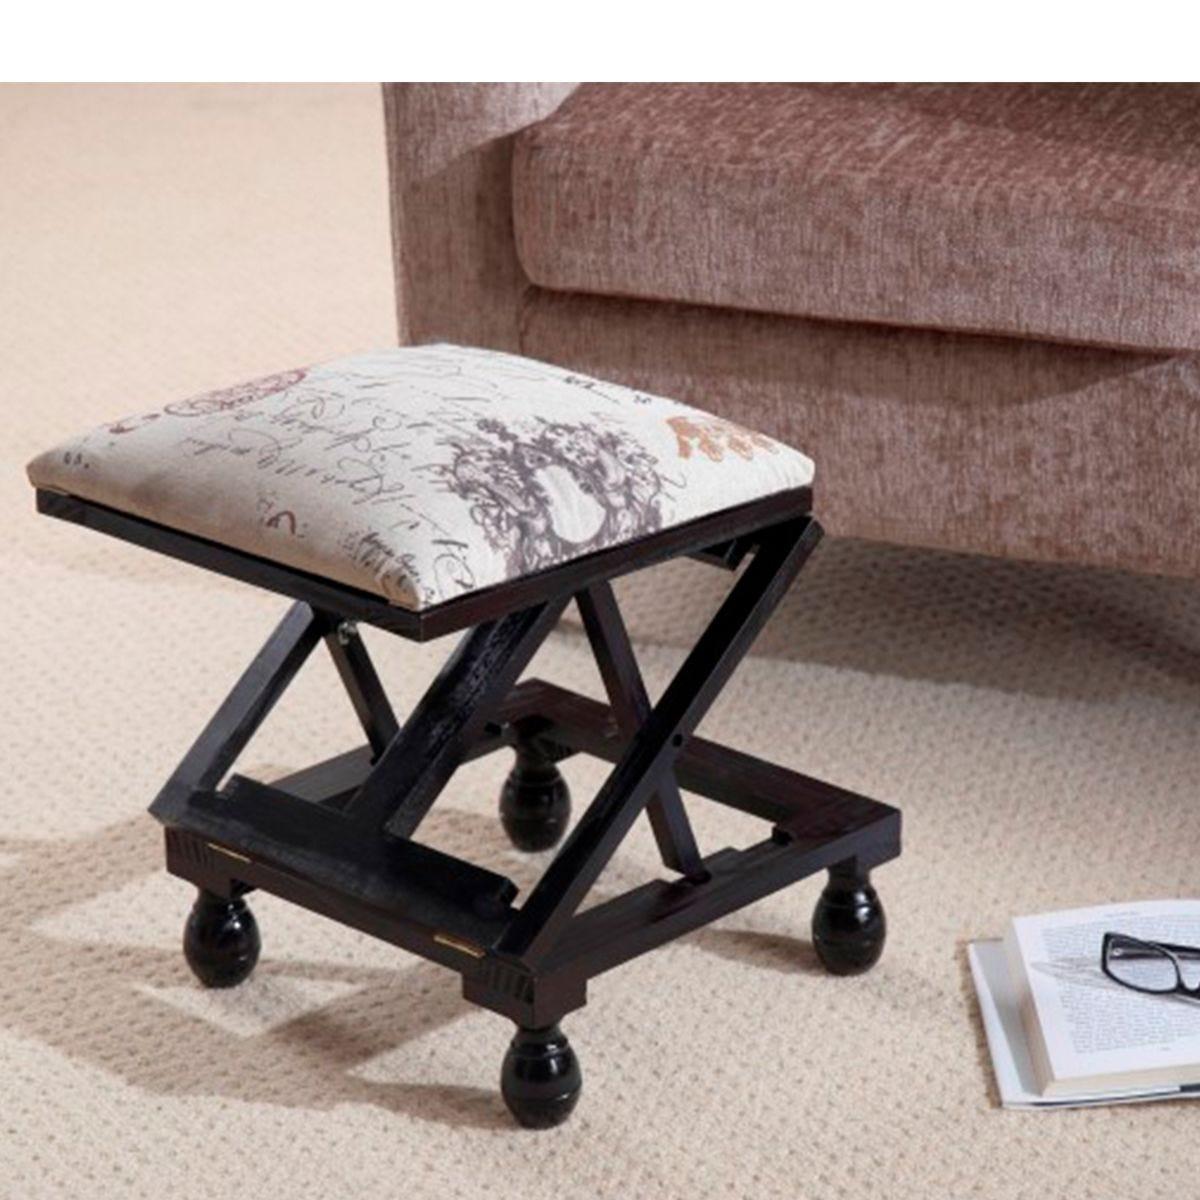 Gablemere 3 Position Footstool - Mahogany